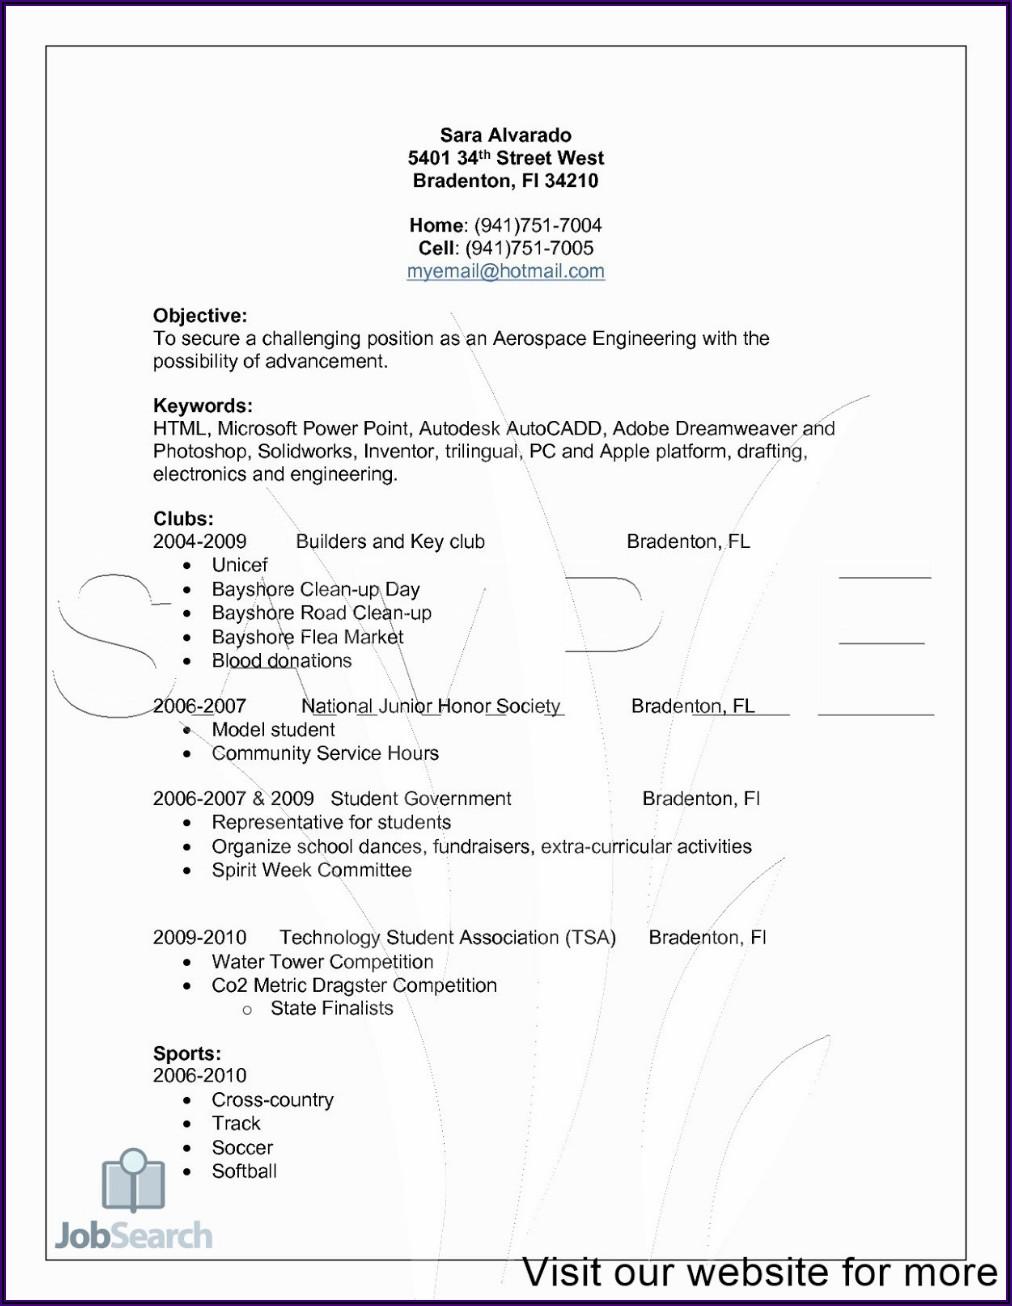 Professional Registered Nurse Resume Template